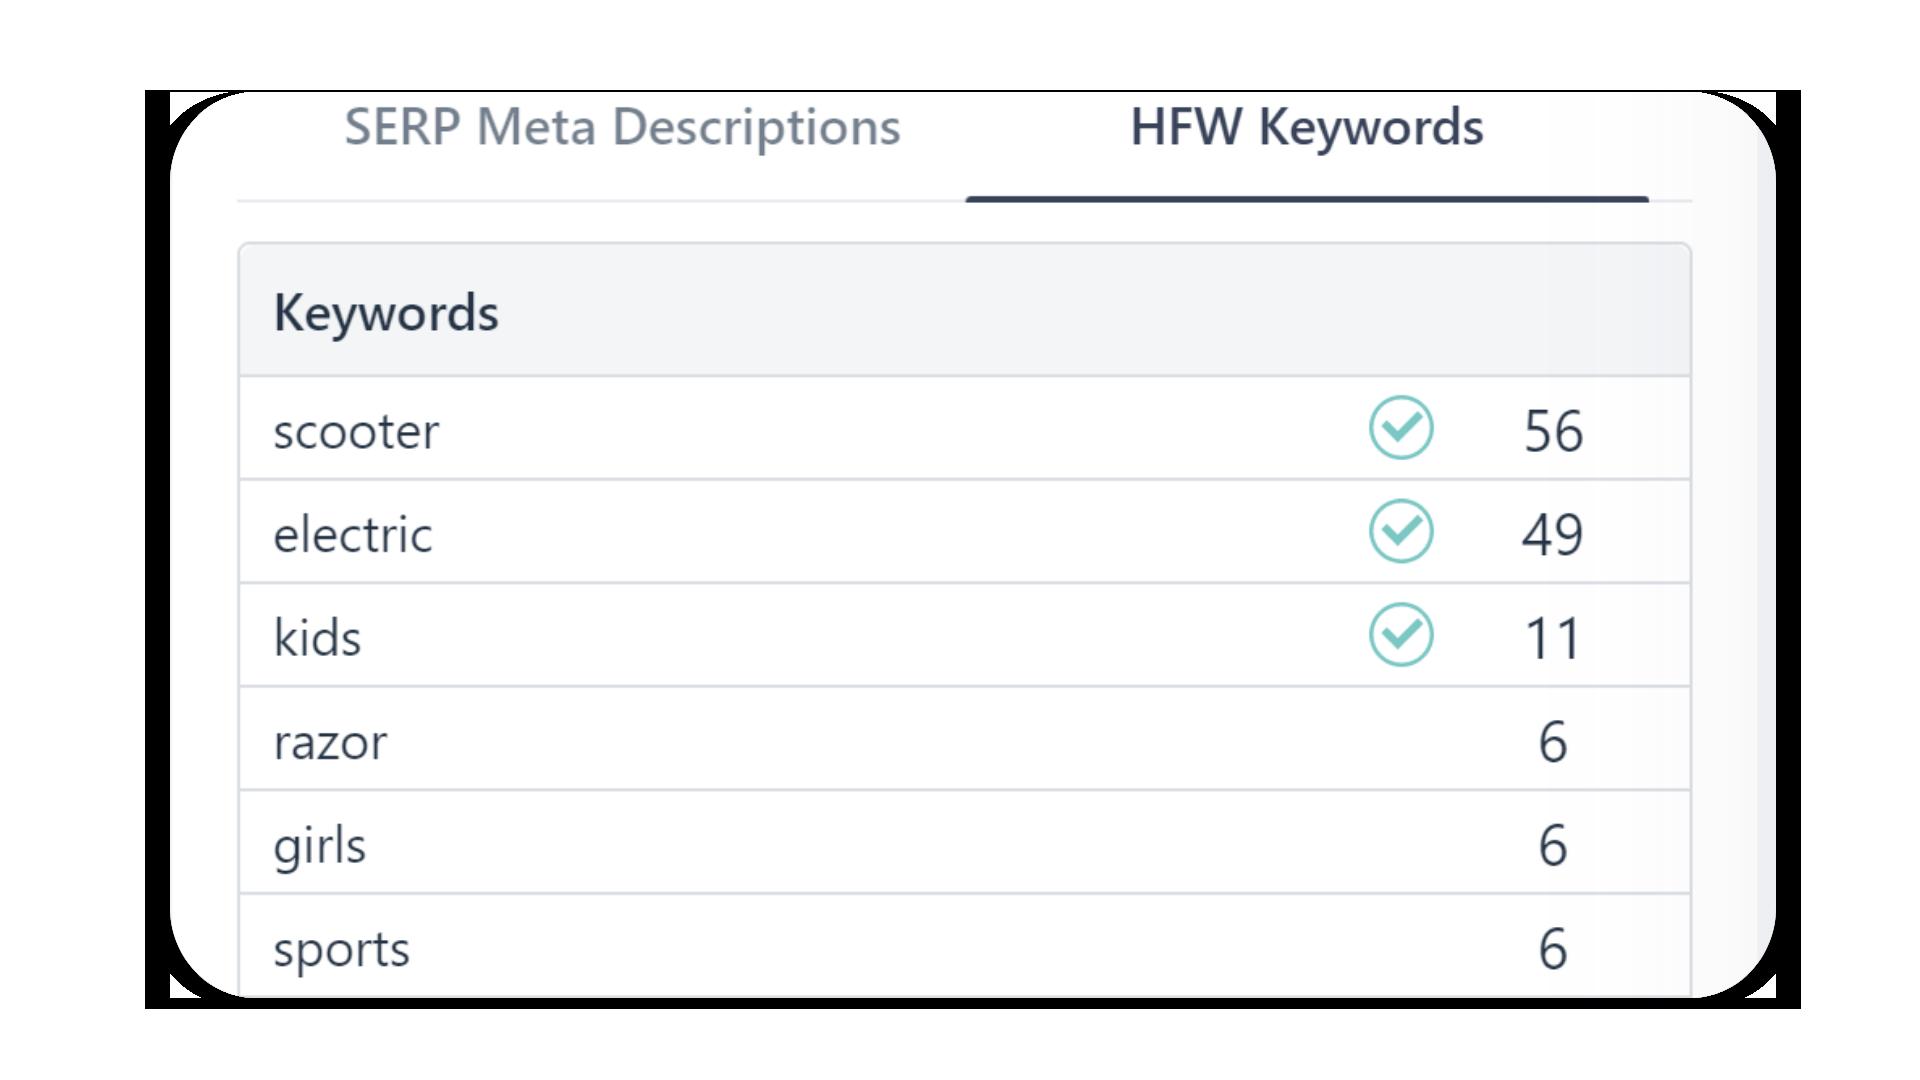 Highest_frequency_keywords